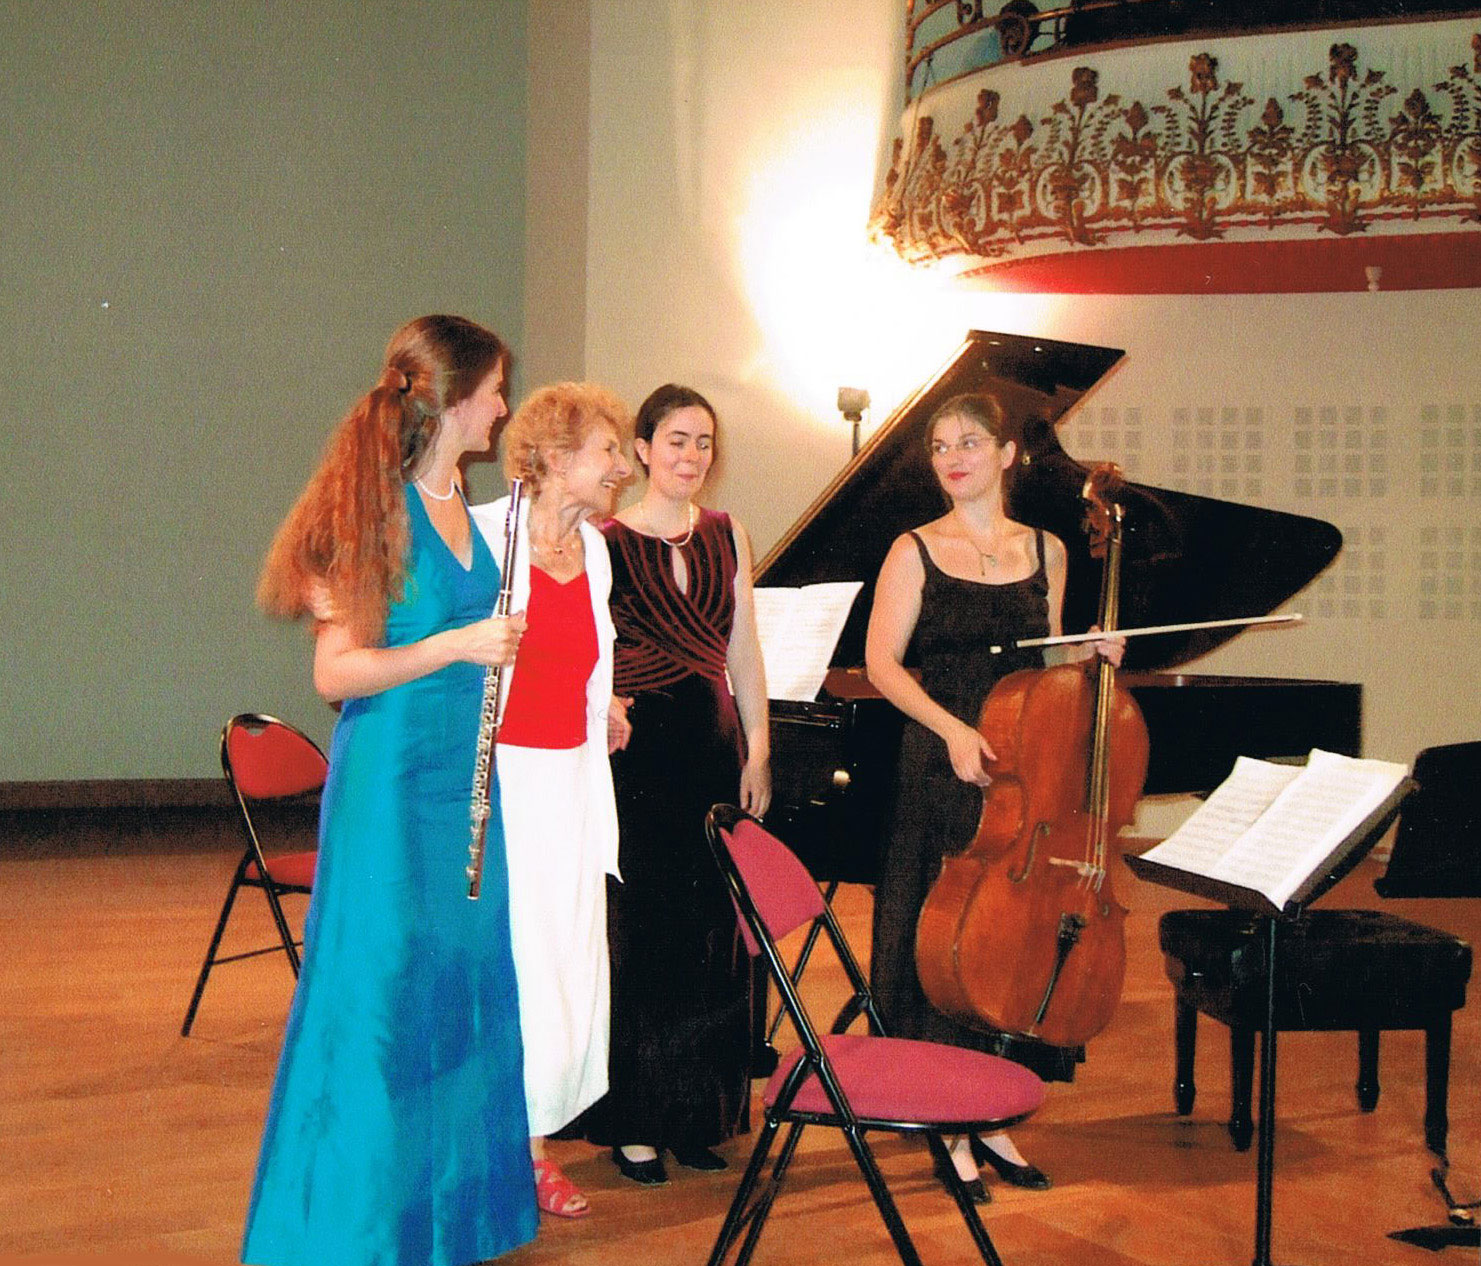 Sarah Louvion, Delphine Bardin, Maryse Castello